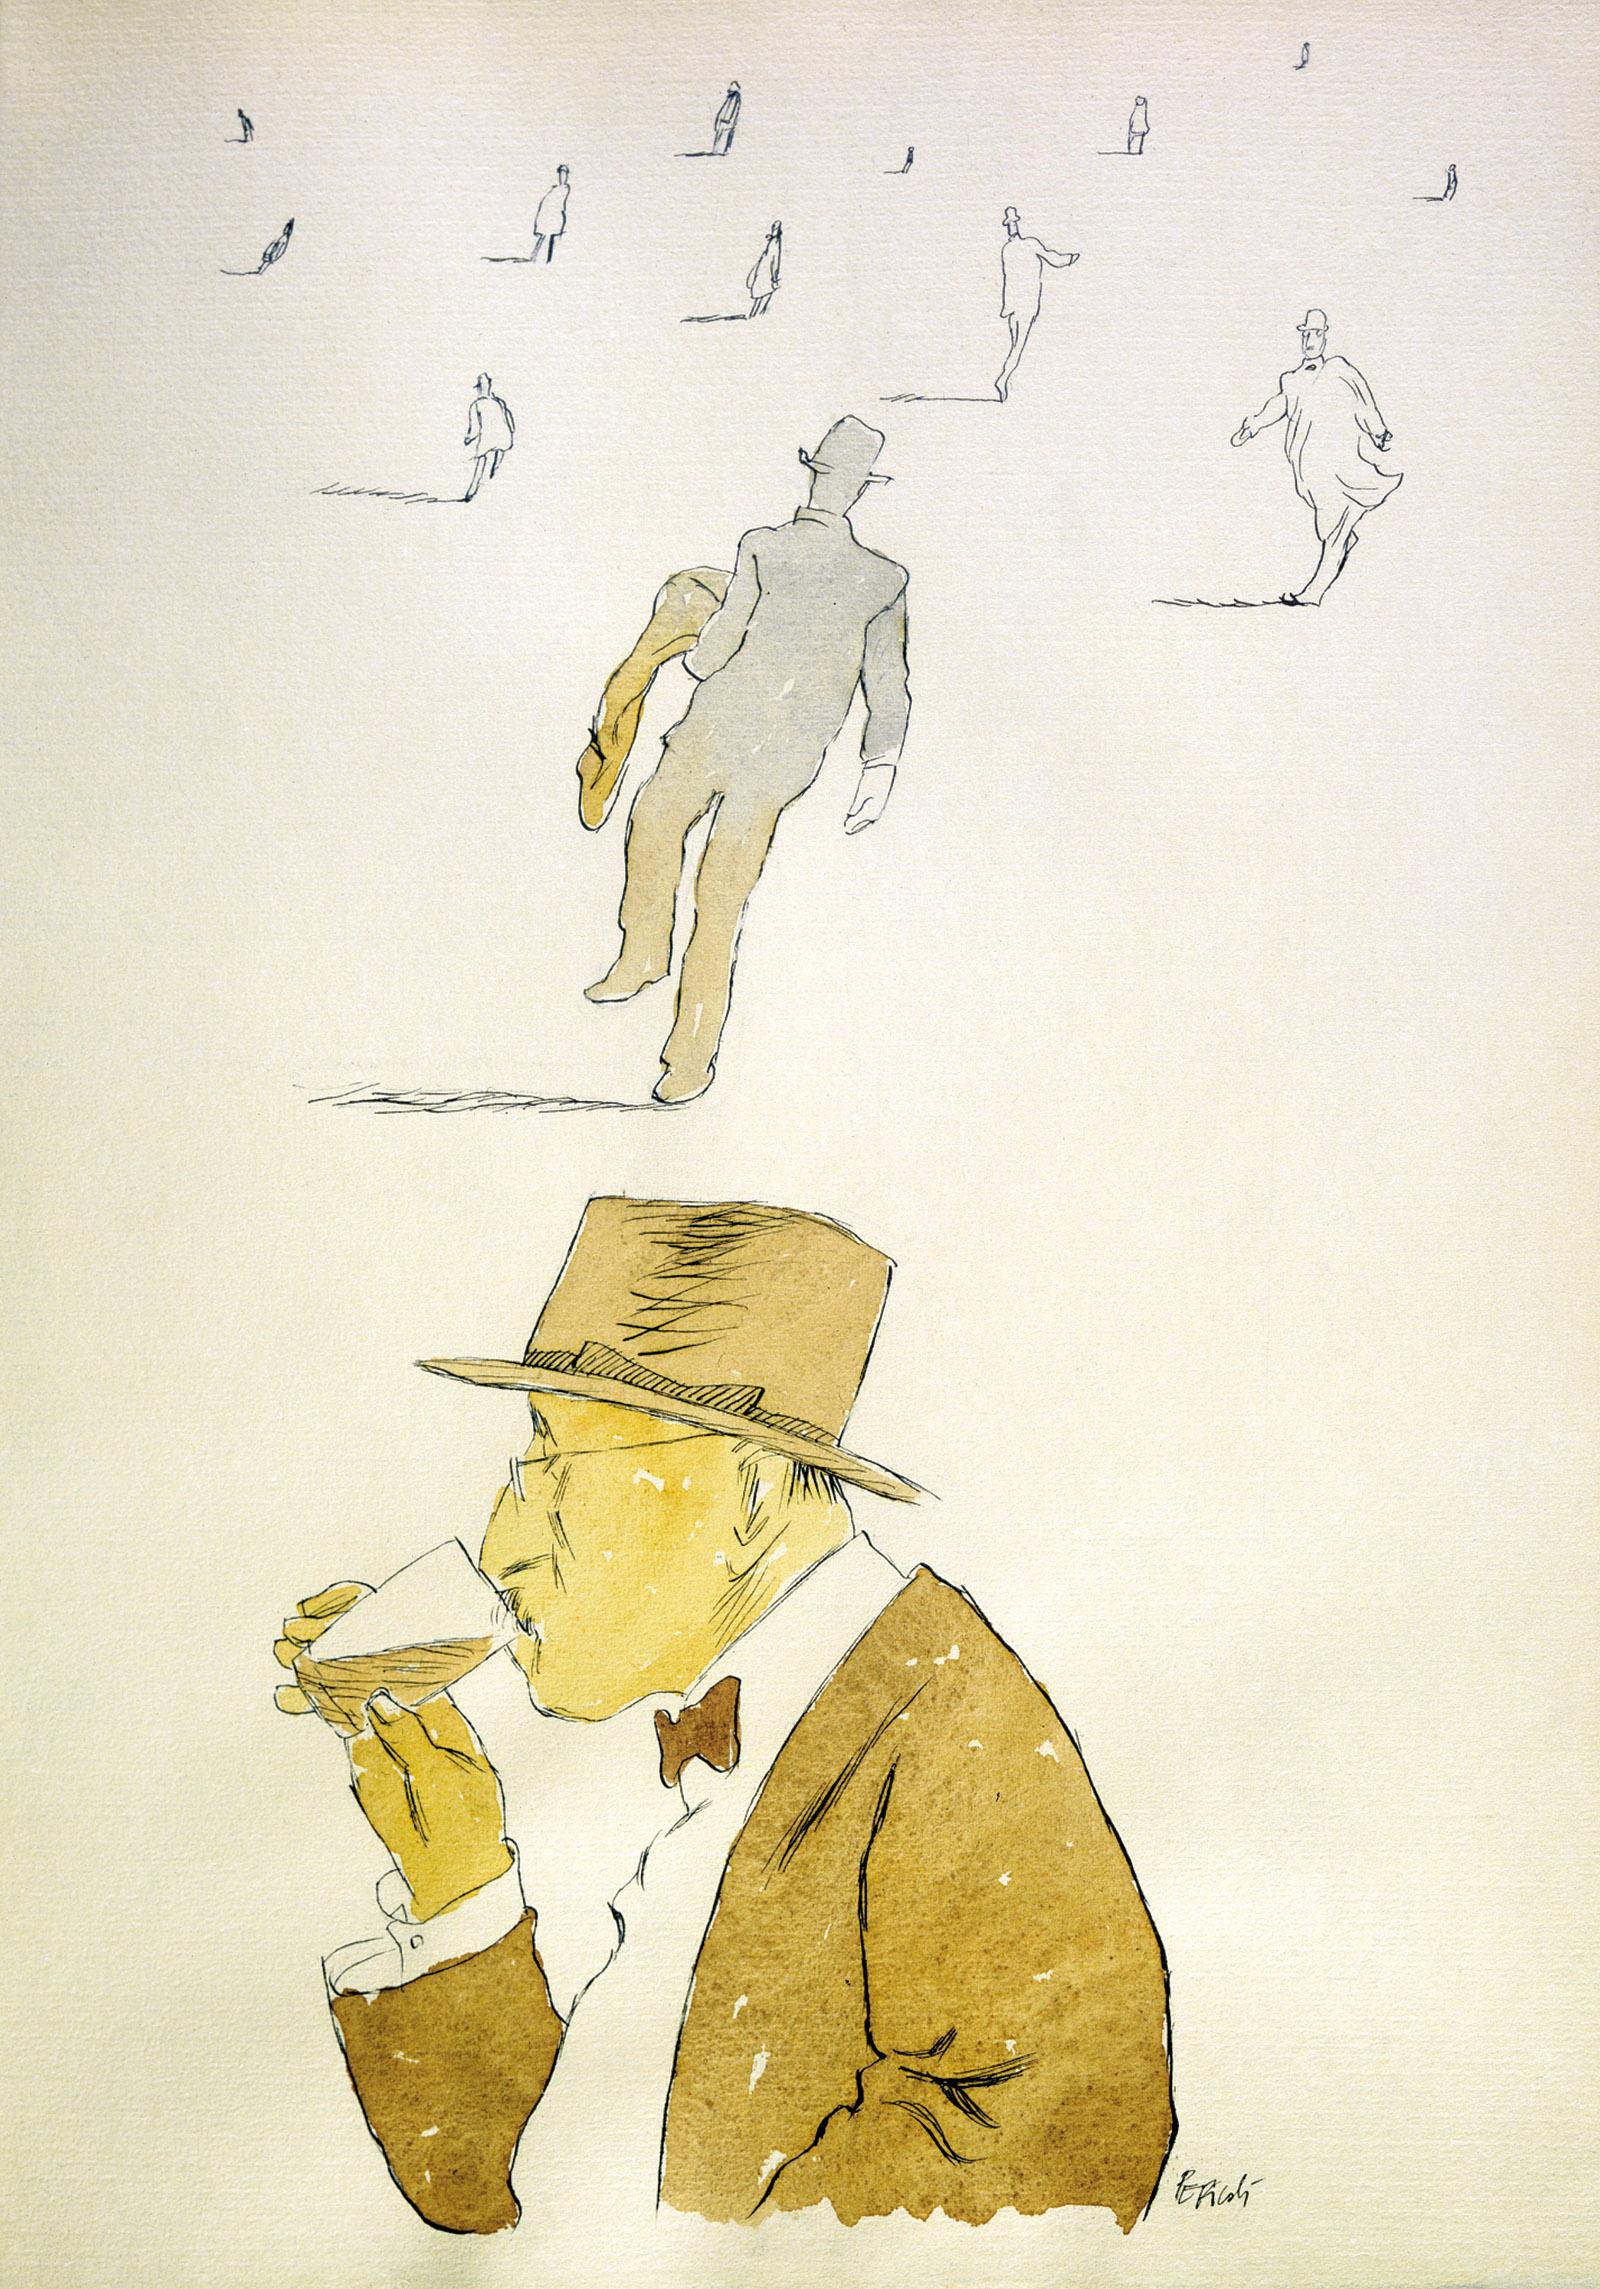 Fernando Pessoa; illustration by Tullio Pericoli, 2002